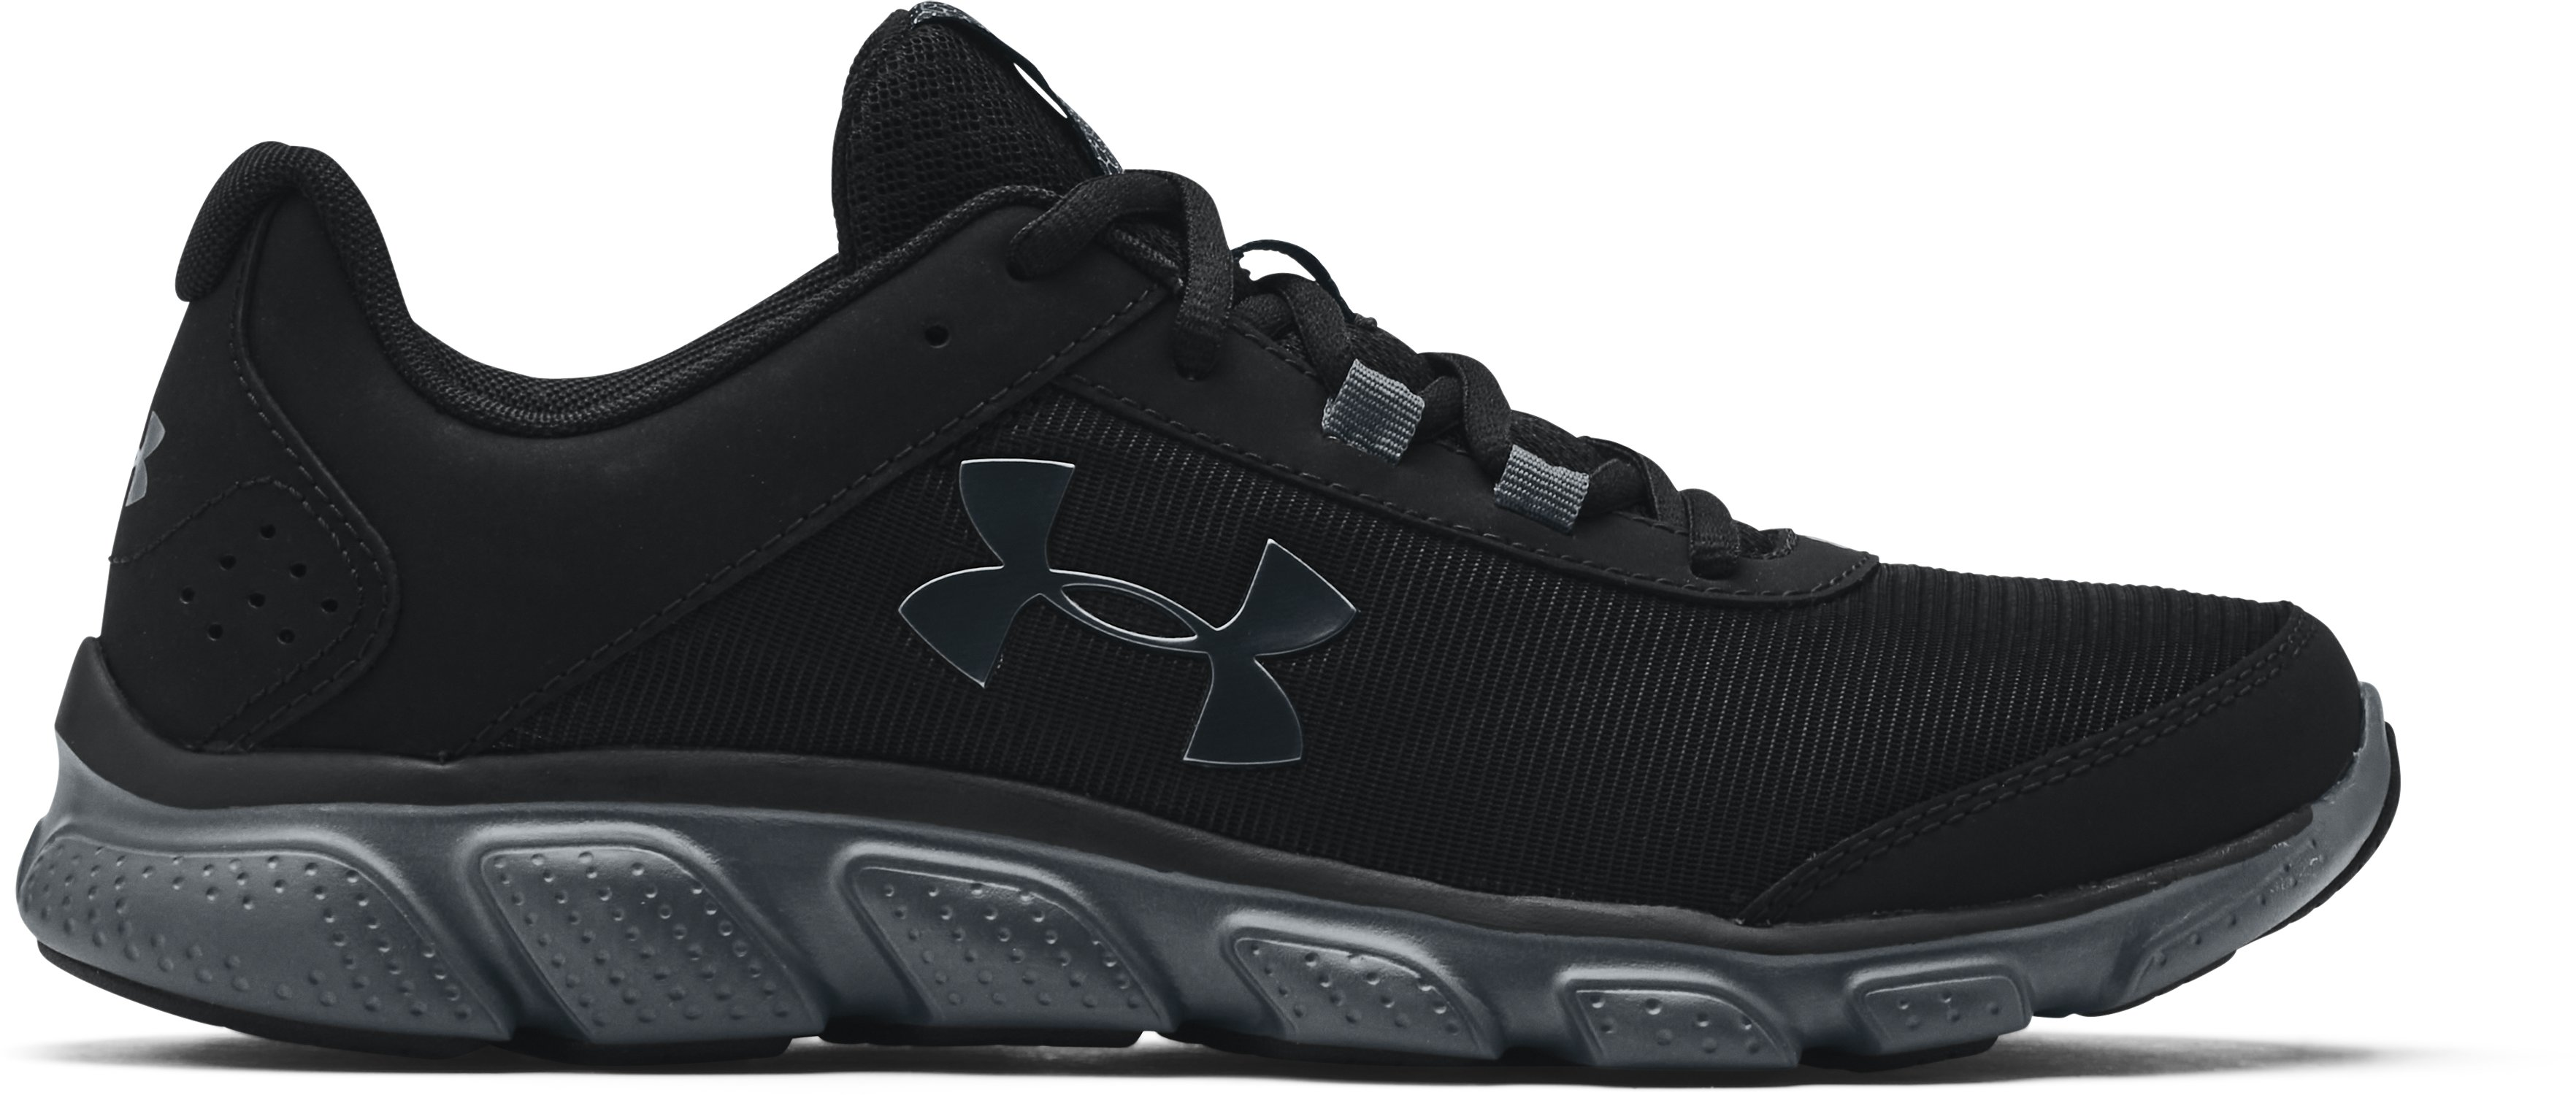 Men's UA Micro G® Assert 7 Running Shoes, Black , , Black , Click to view full size